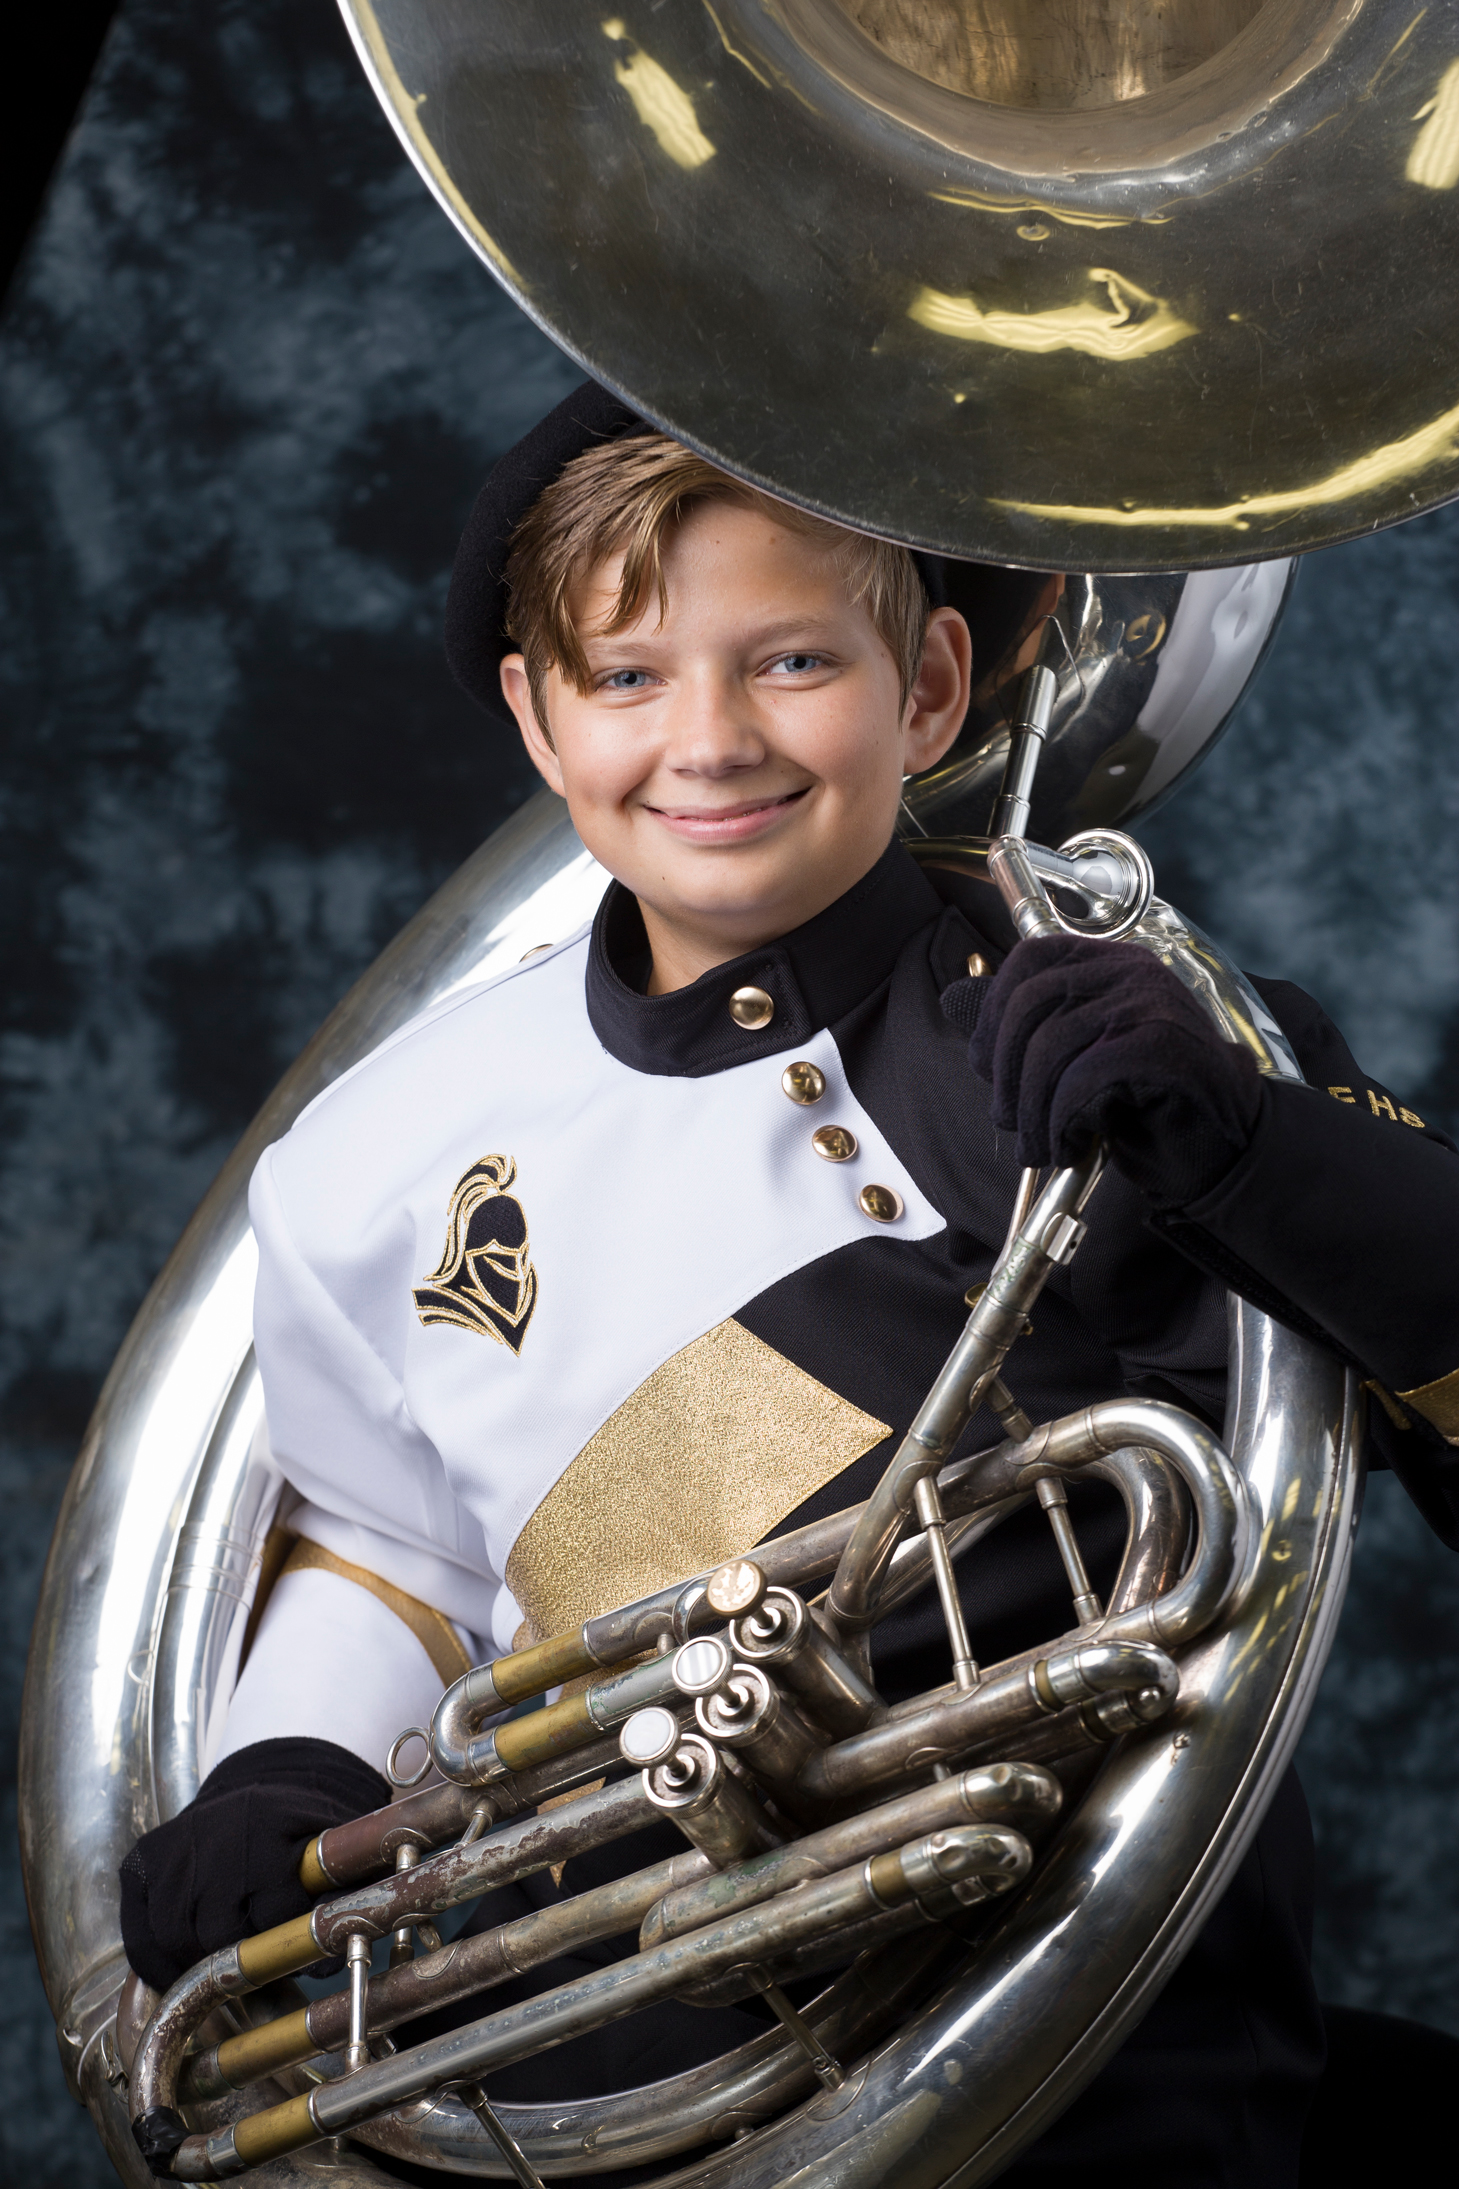 high-school-band-portraits-3.jpg